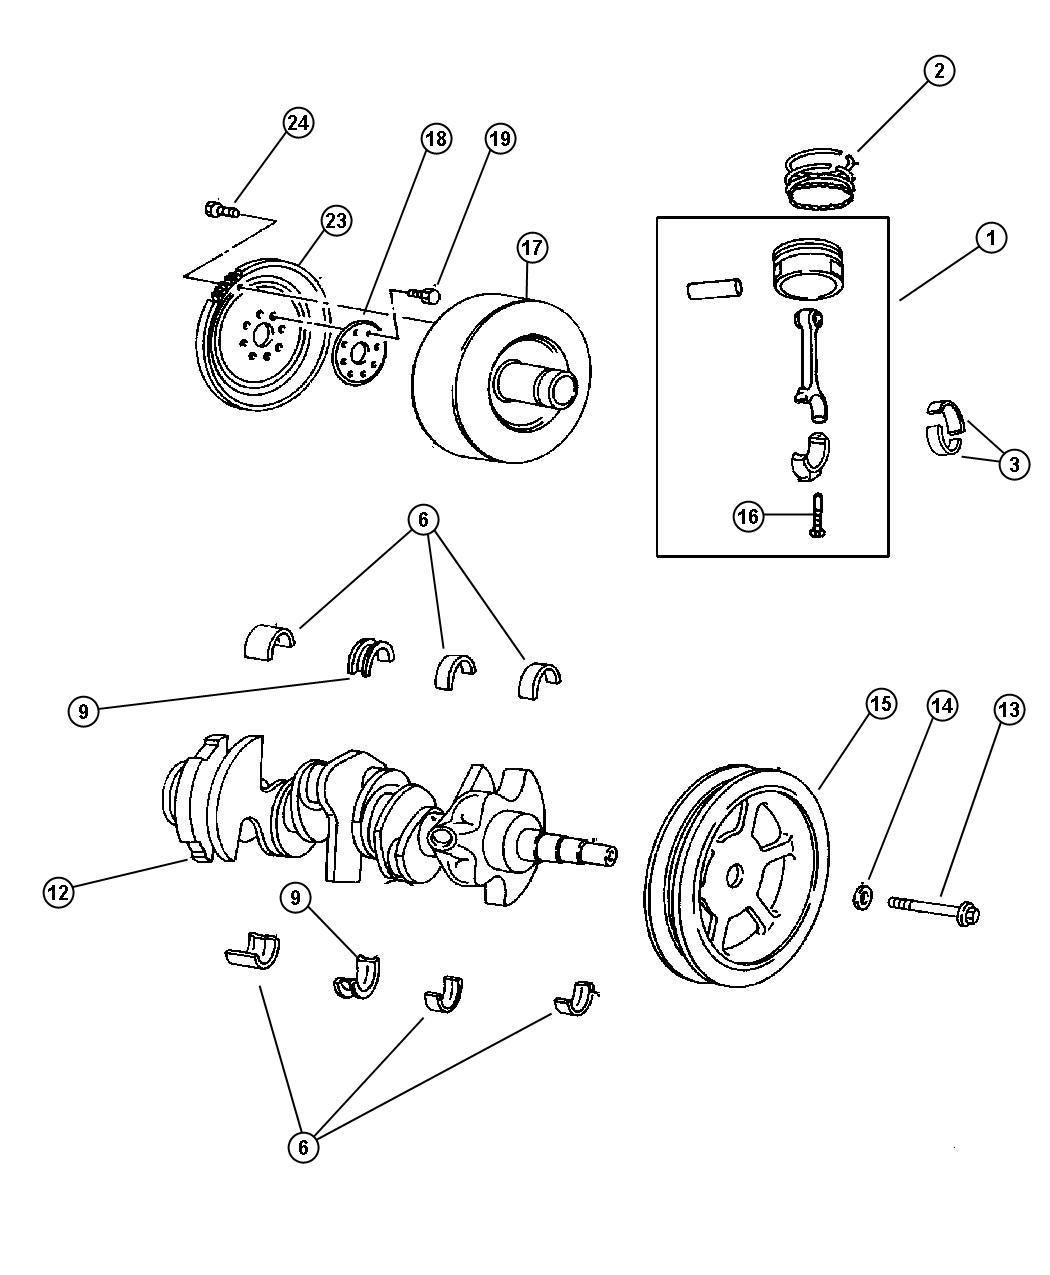 Pacifica Crankshaft And Pistons 3 8l 3 8l V6 Ohv Engine